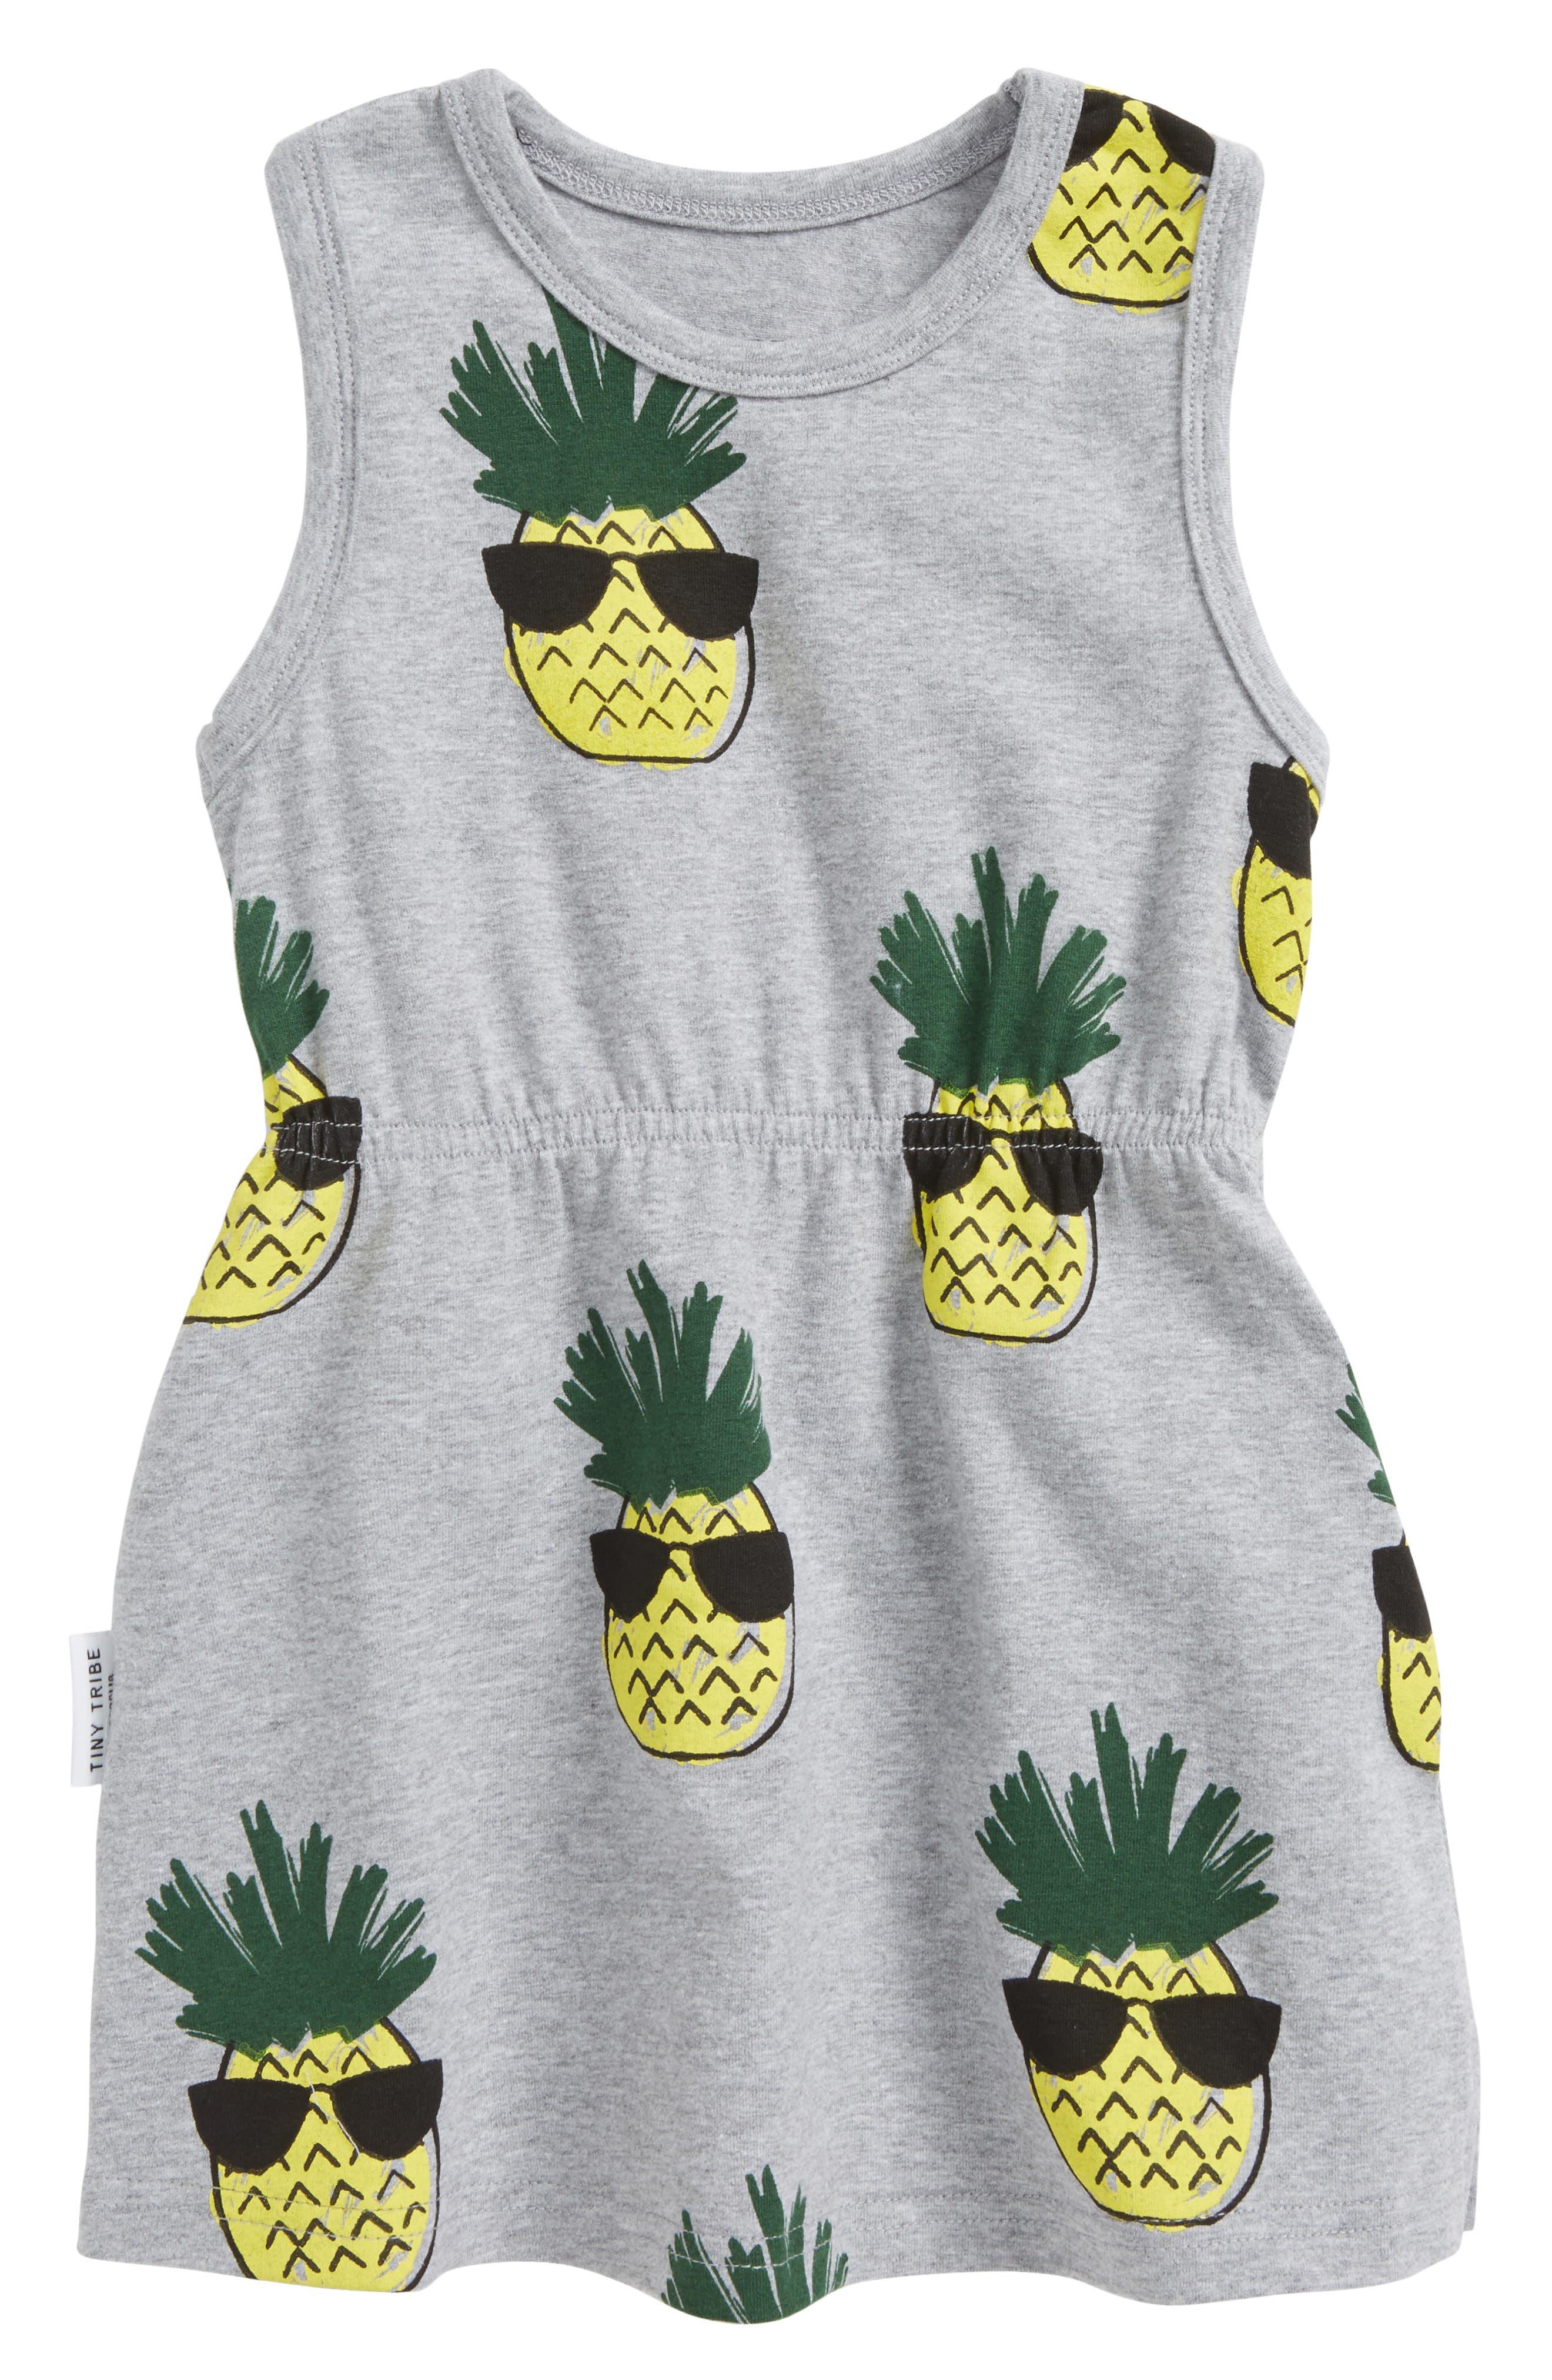 Main Image - Tiny Tribe Cool Pineapple Racerback Dress (Baby Girls)